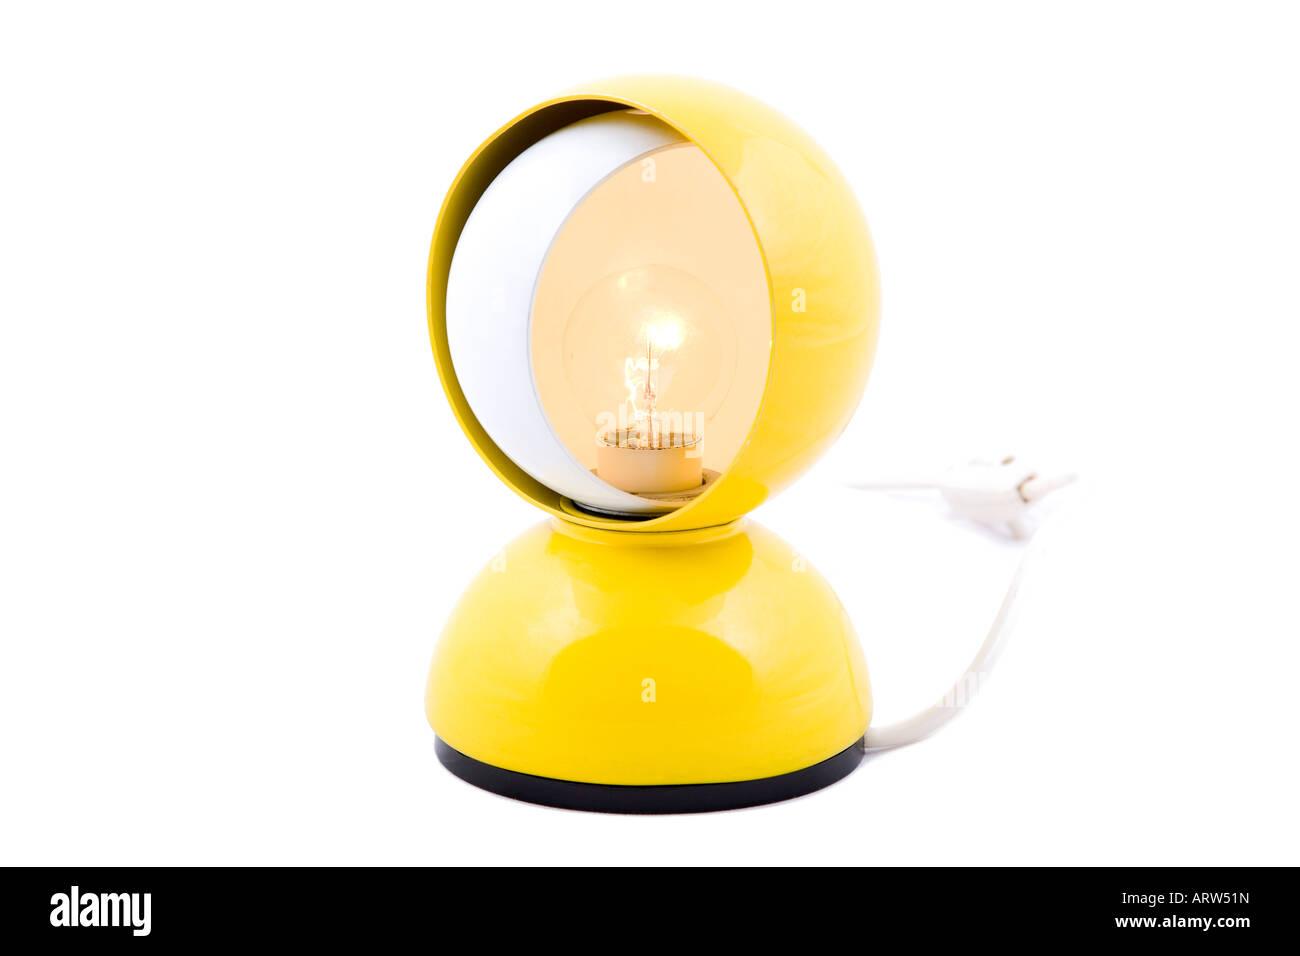 Eclipse lamp - Stock Image